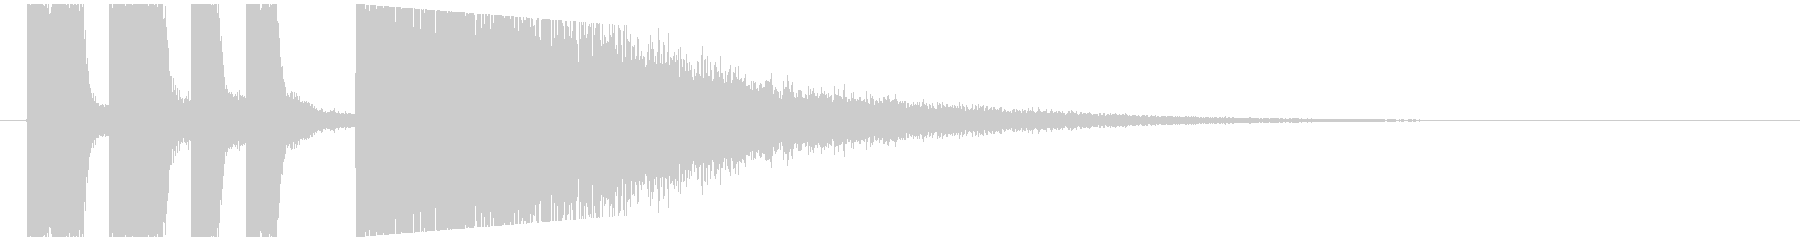 SE - おもしろ登場音の未再生の波形